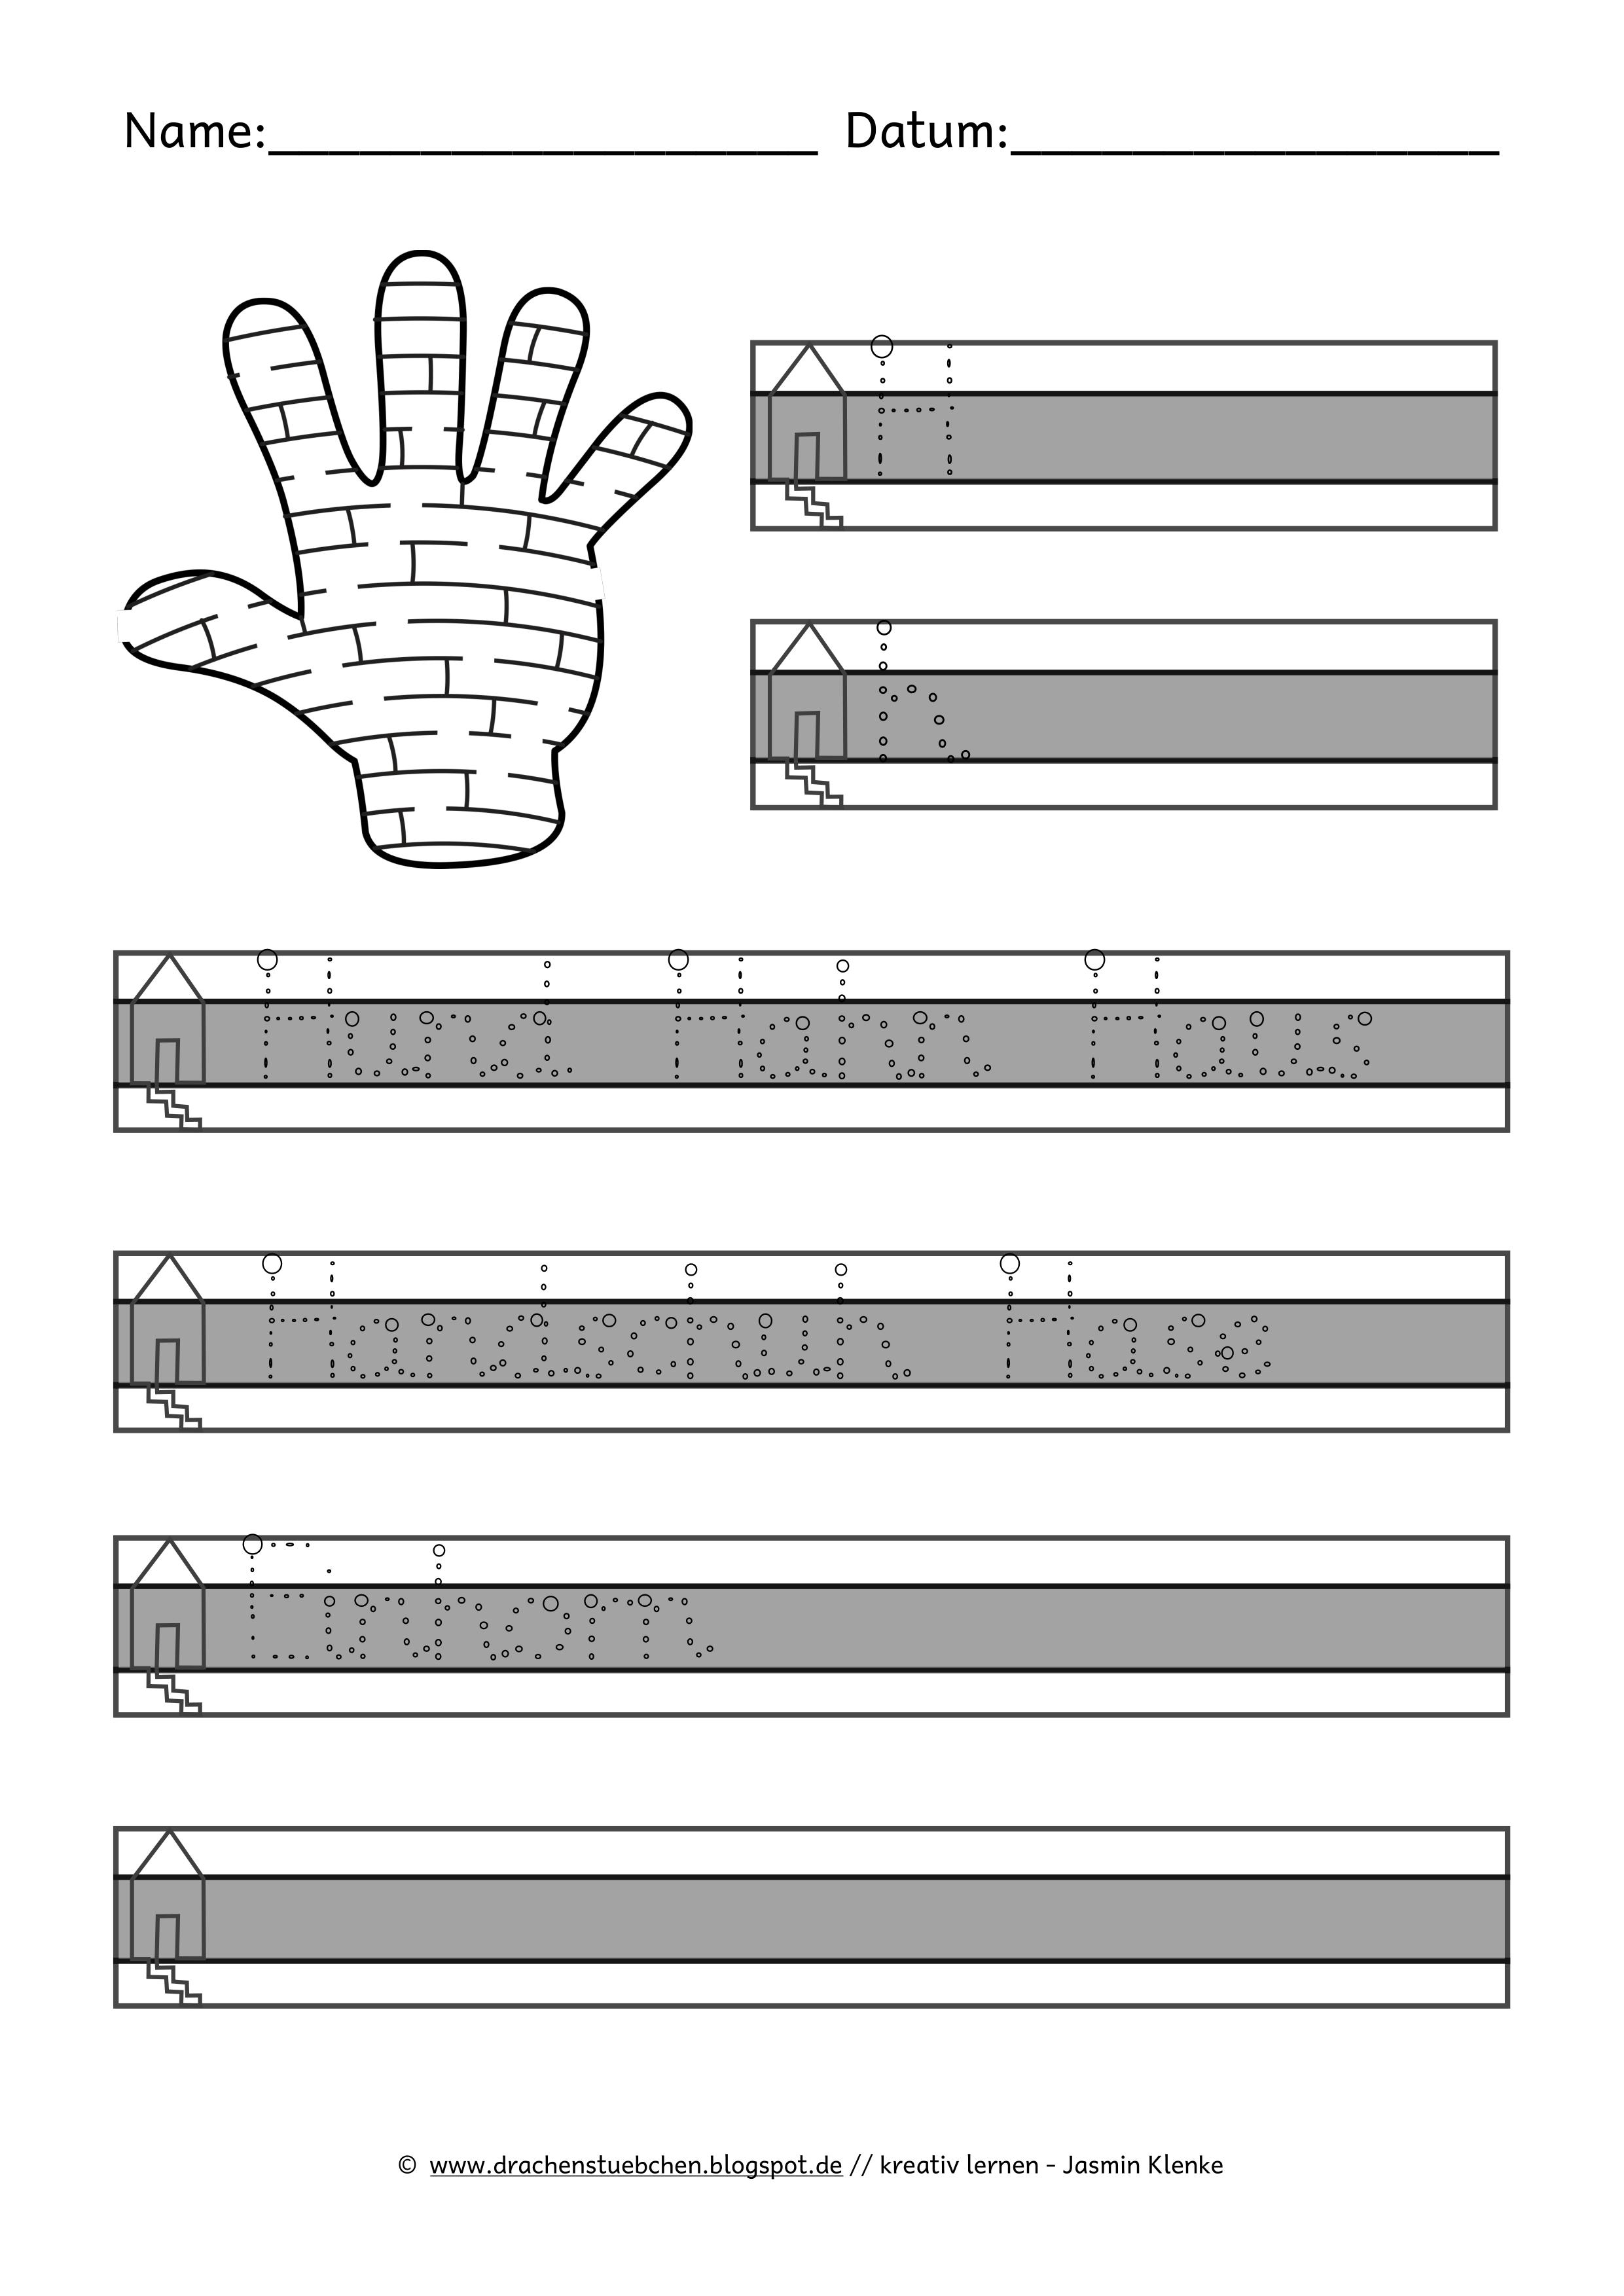 komplettpaket arbeitsbl tter zur alphabetisierung schreiblehrgang alle buchstaben f r daf. Black Bedroom Furniture Sets. Home Design Ideas